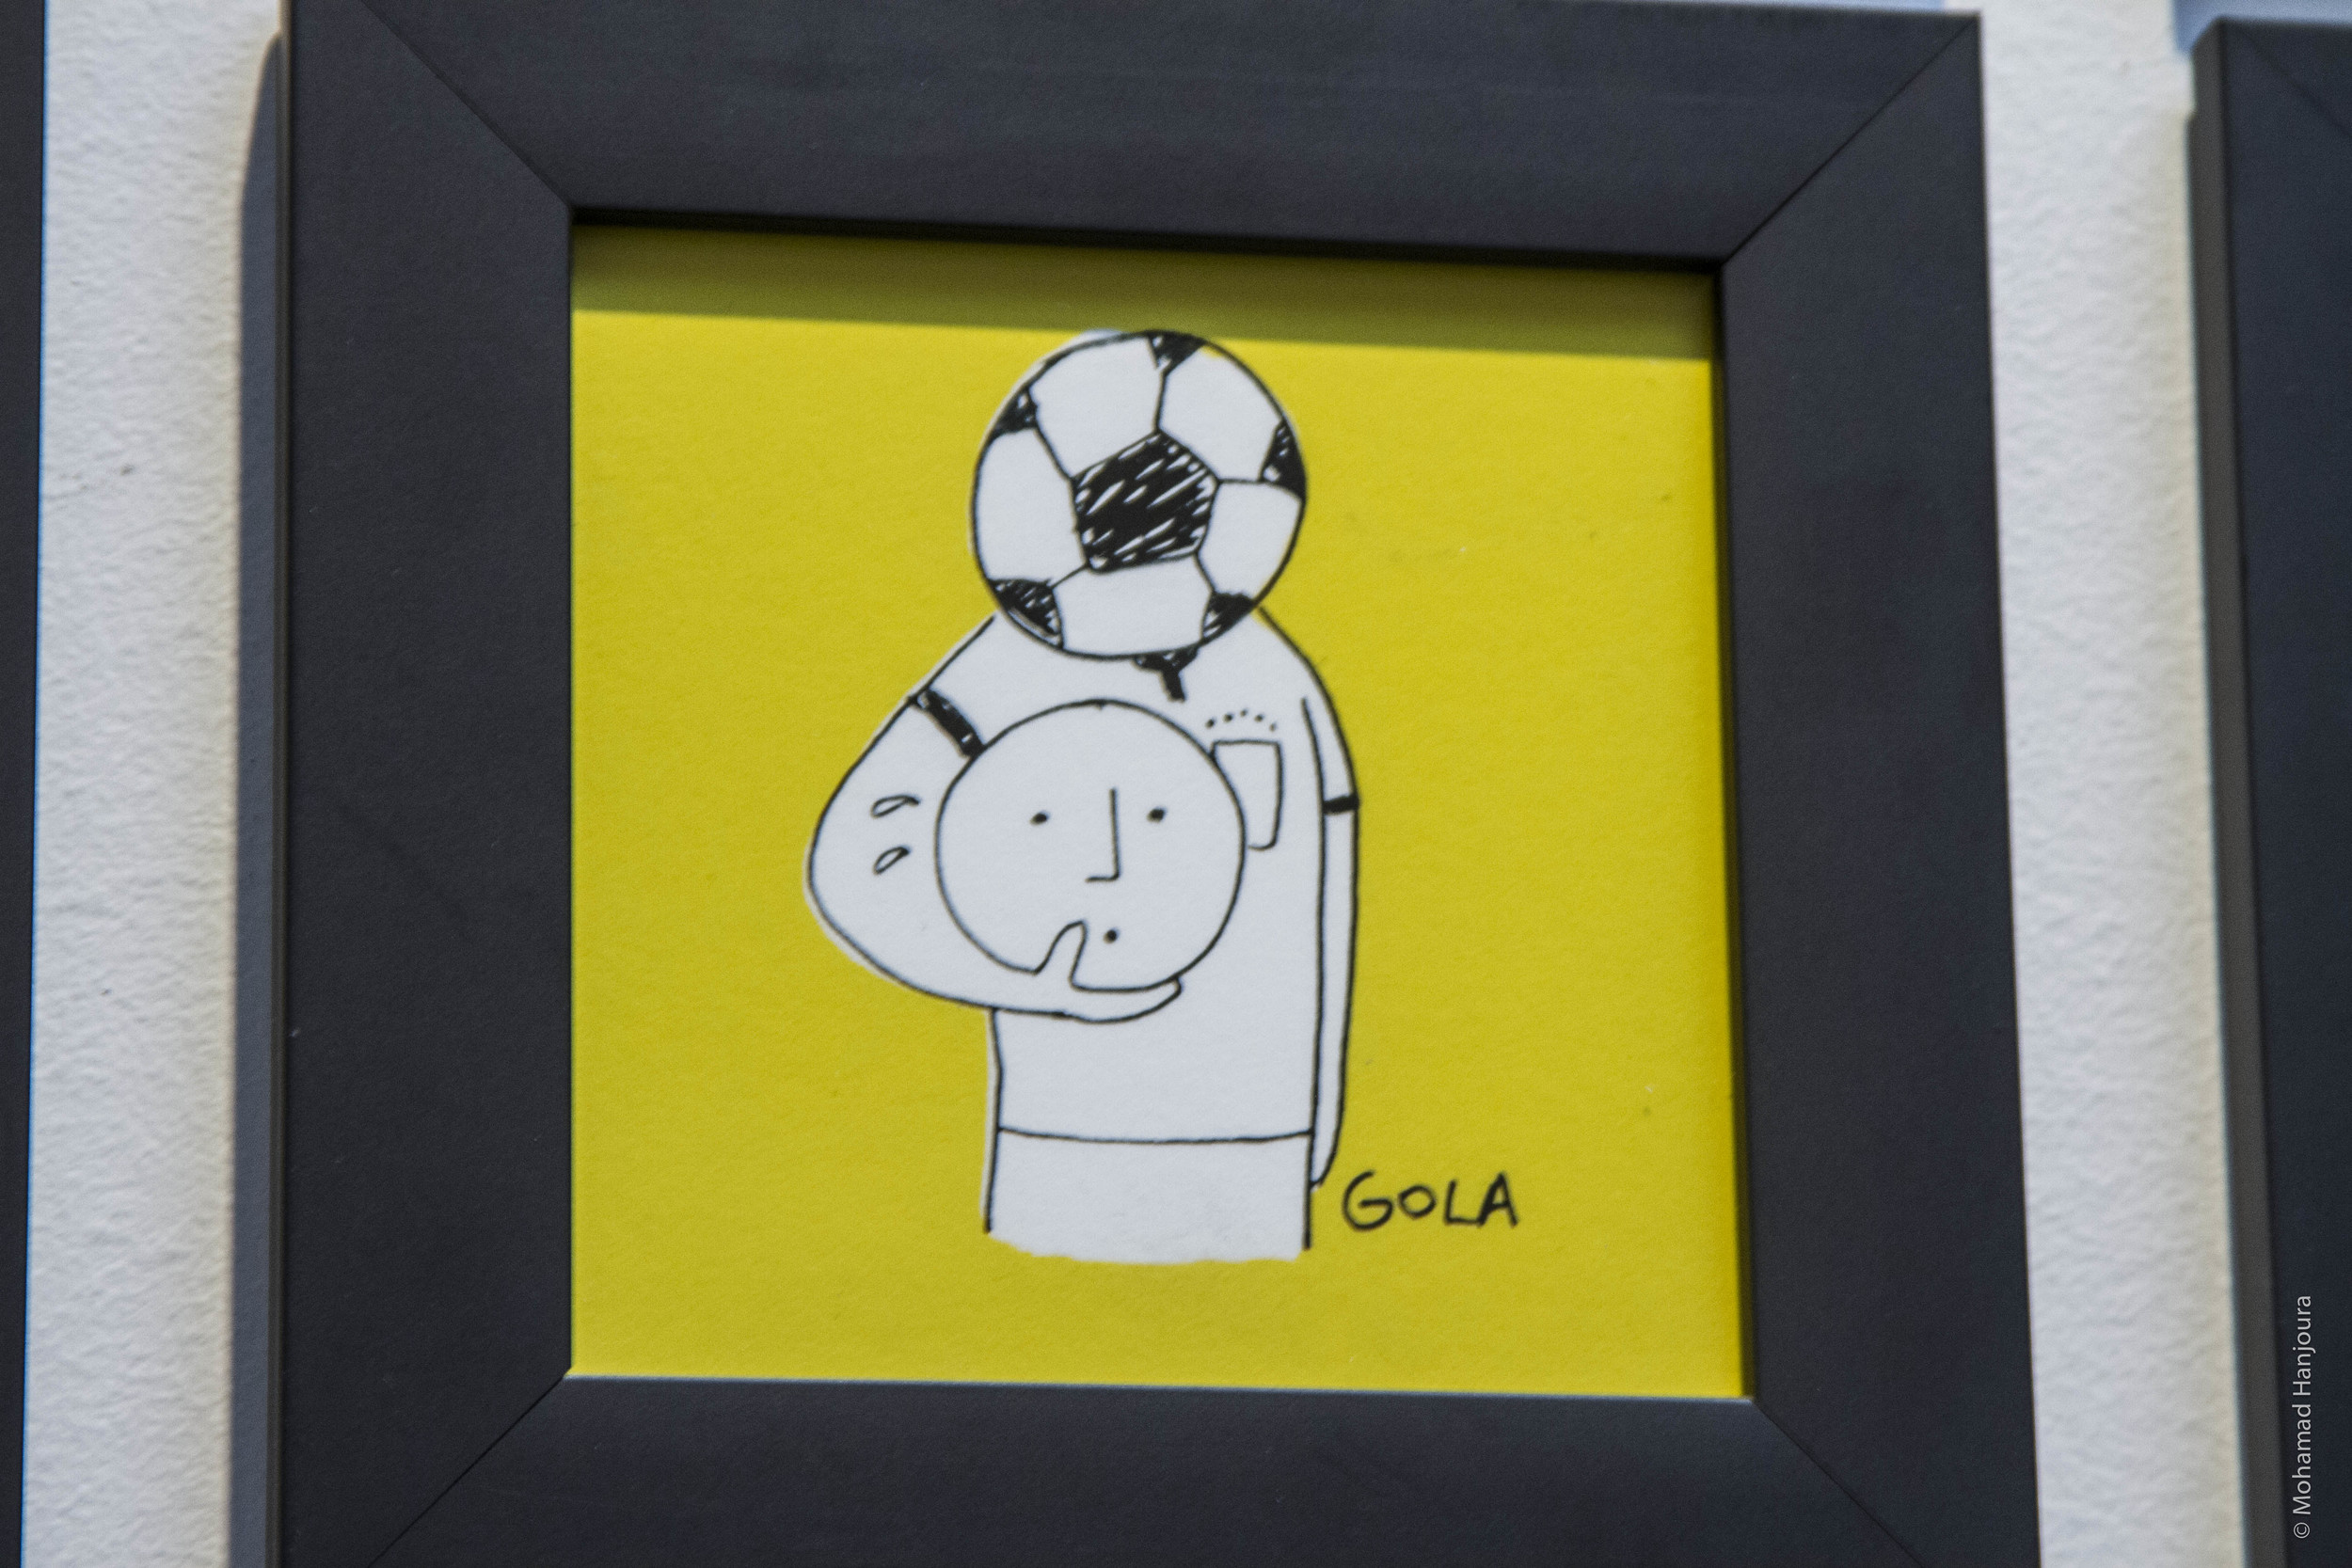 André Gola